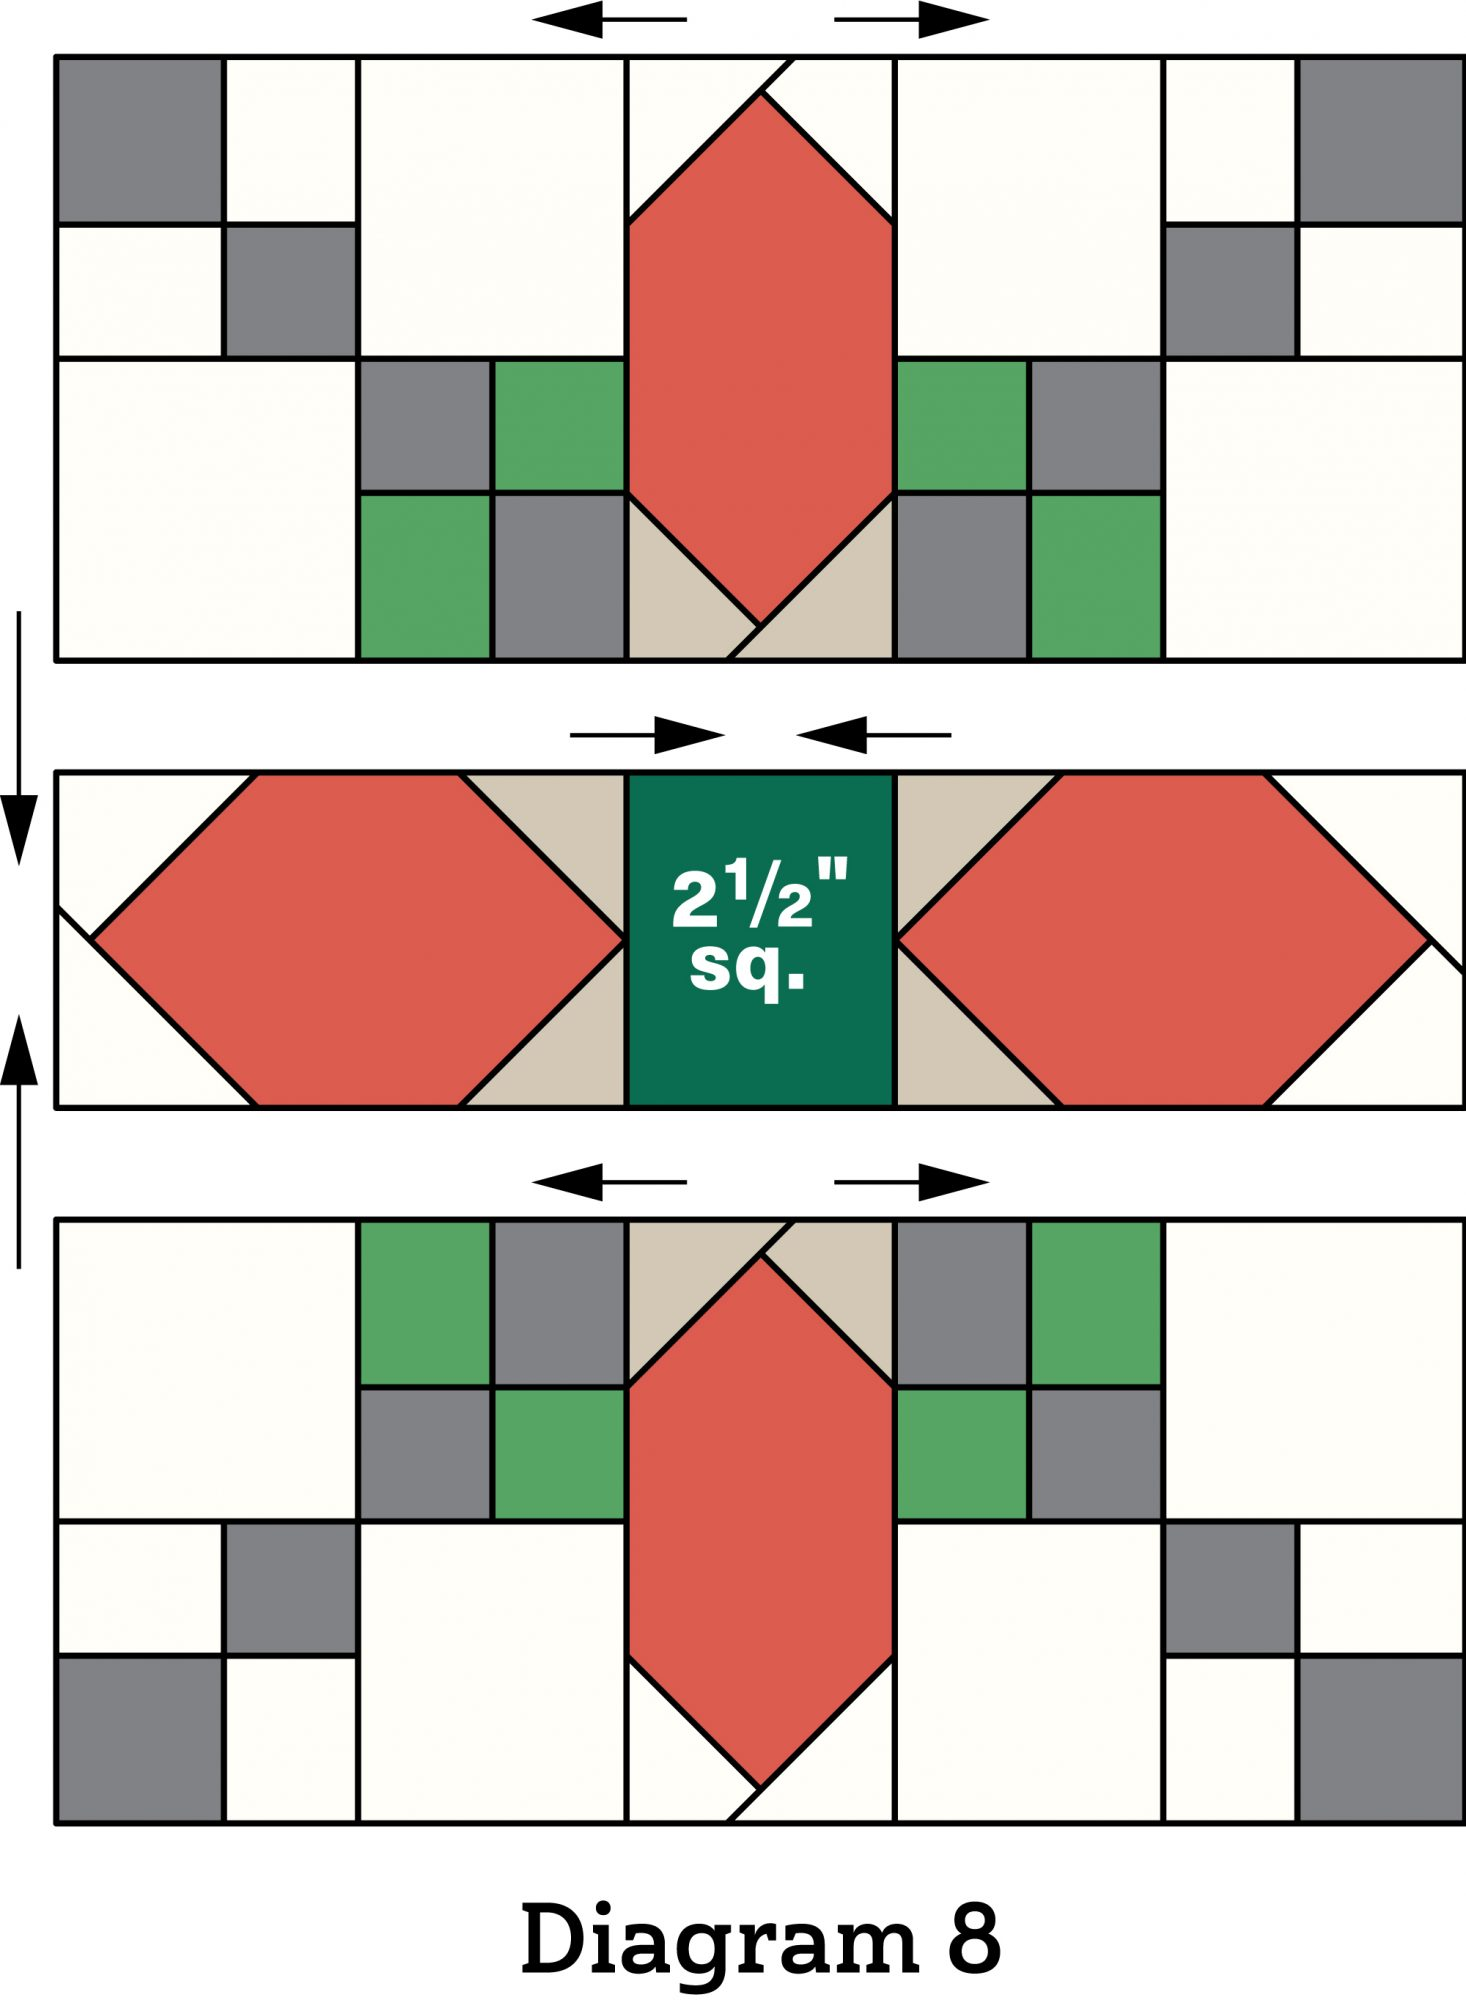 Good Tidings diagram 8